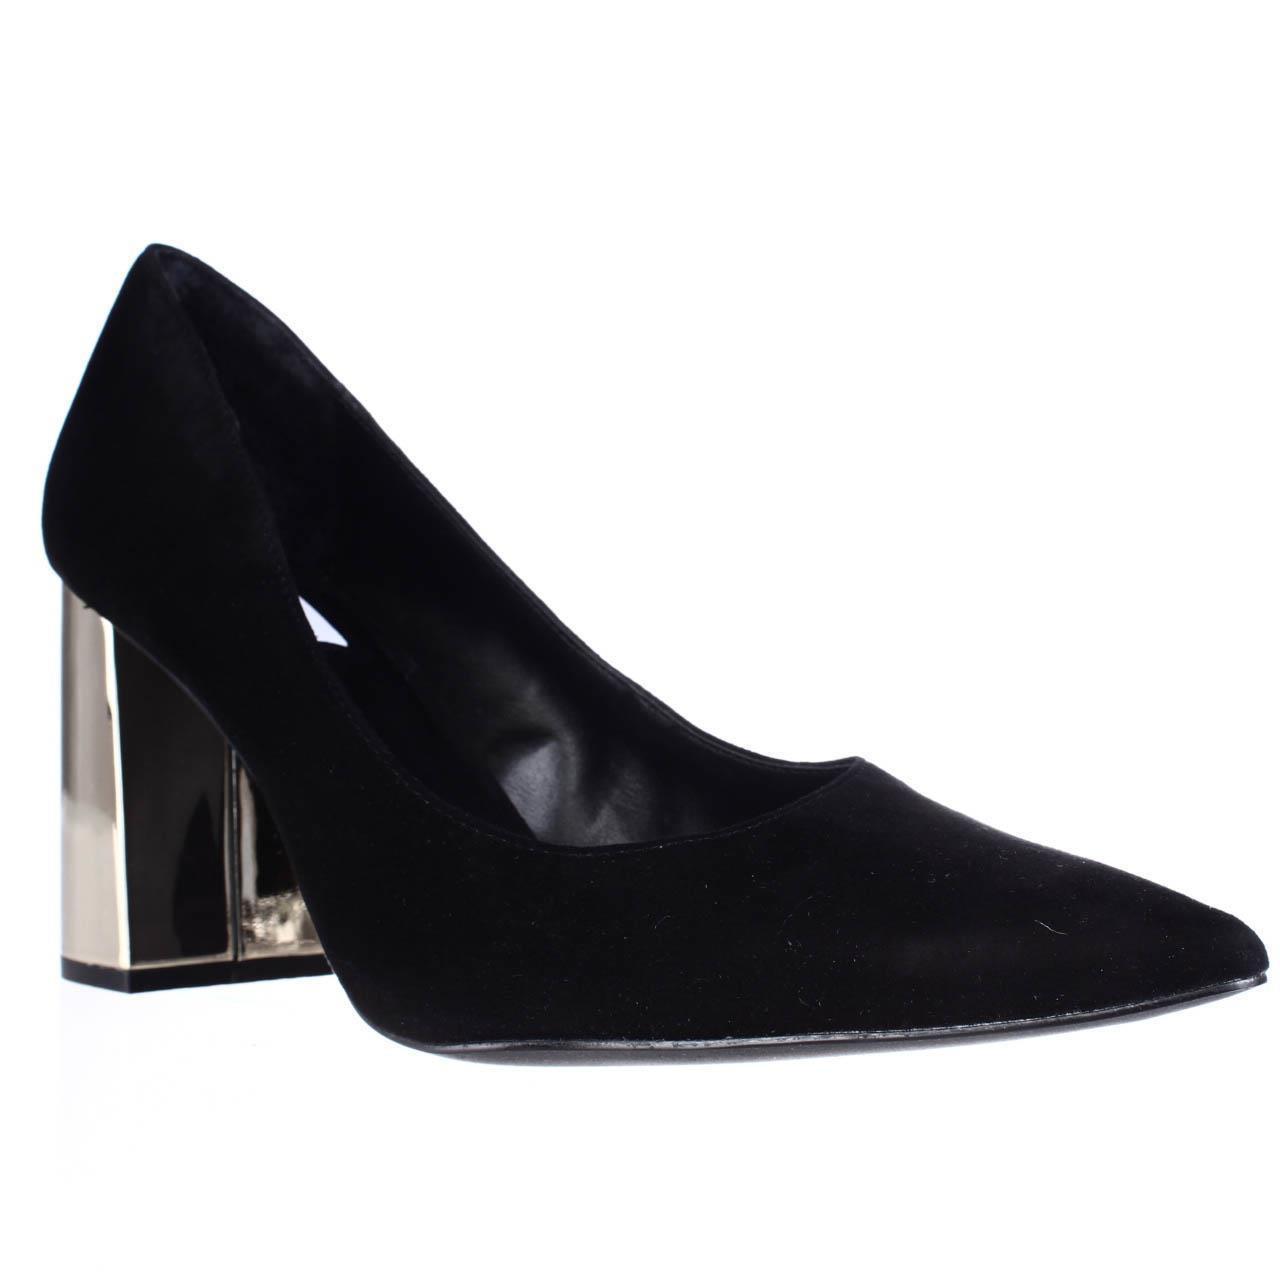 1dc30c39b74 Steve Madden - Pointur Block Heel Dress Pumps, Black - Lyst